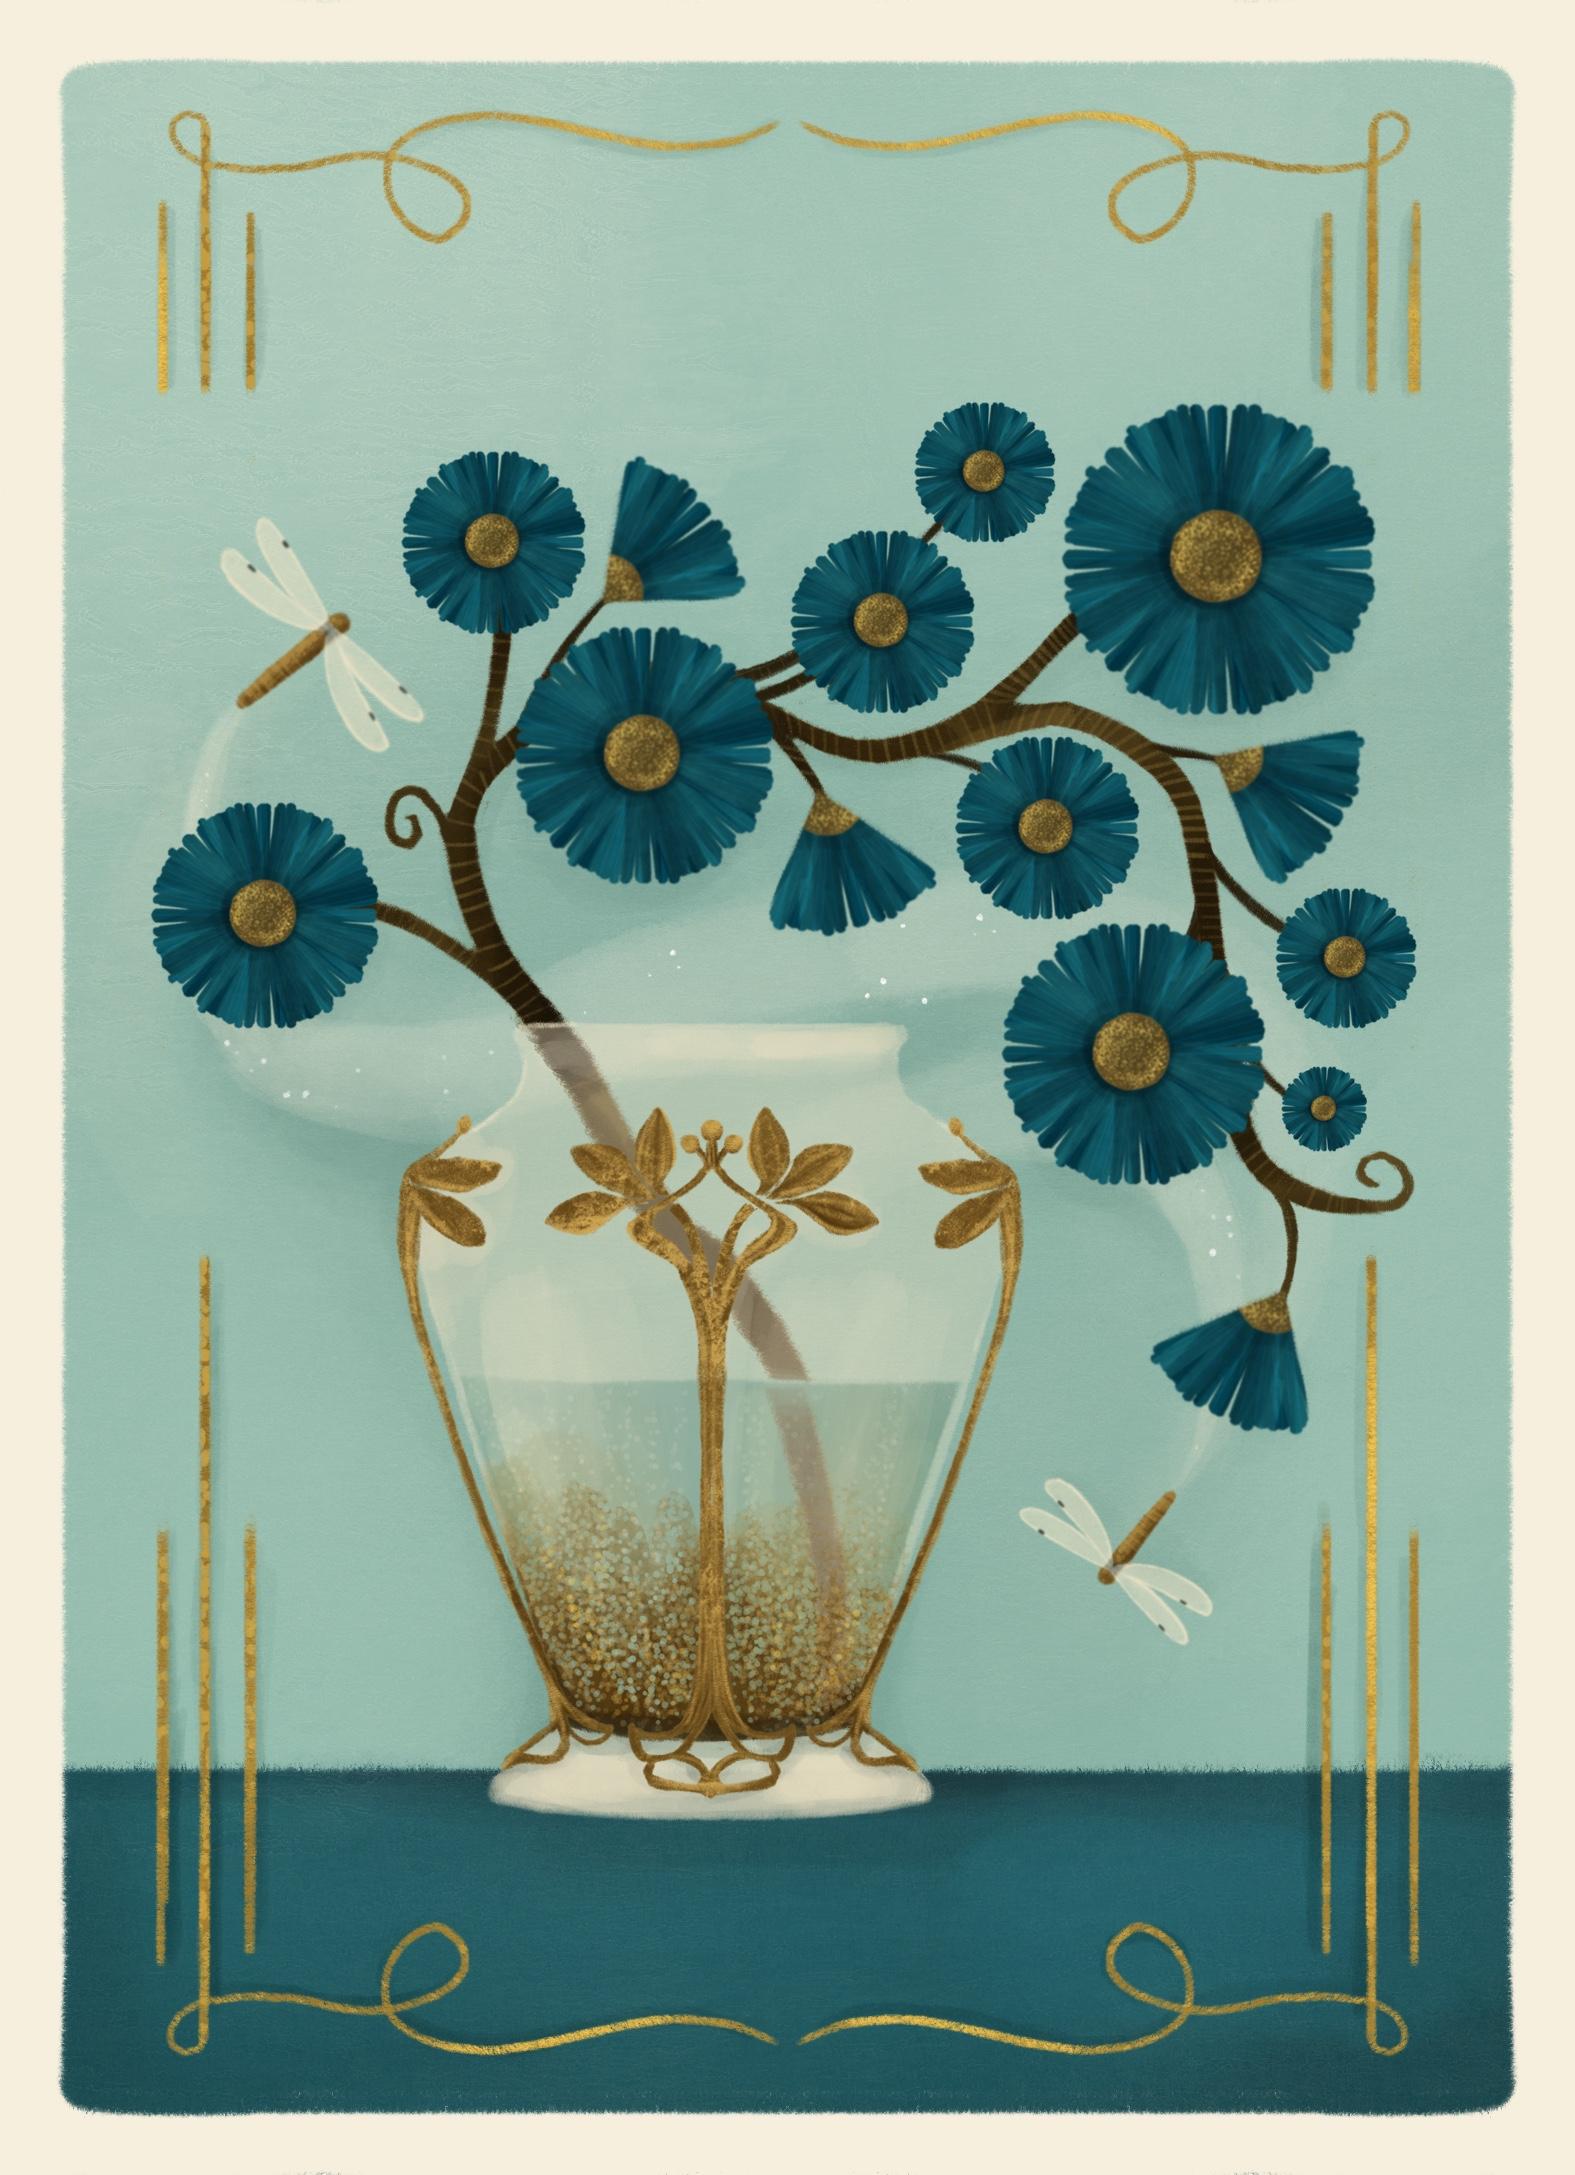 Flowers_greetingcard_kellyannedalton.jpg